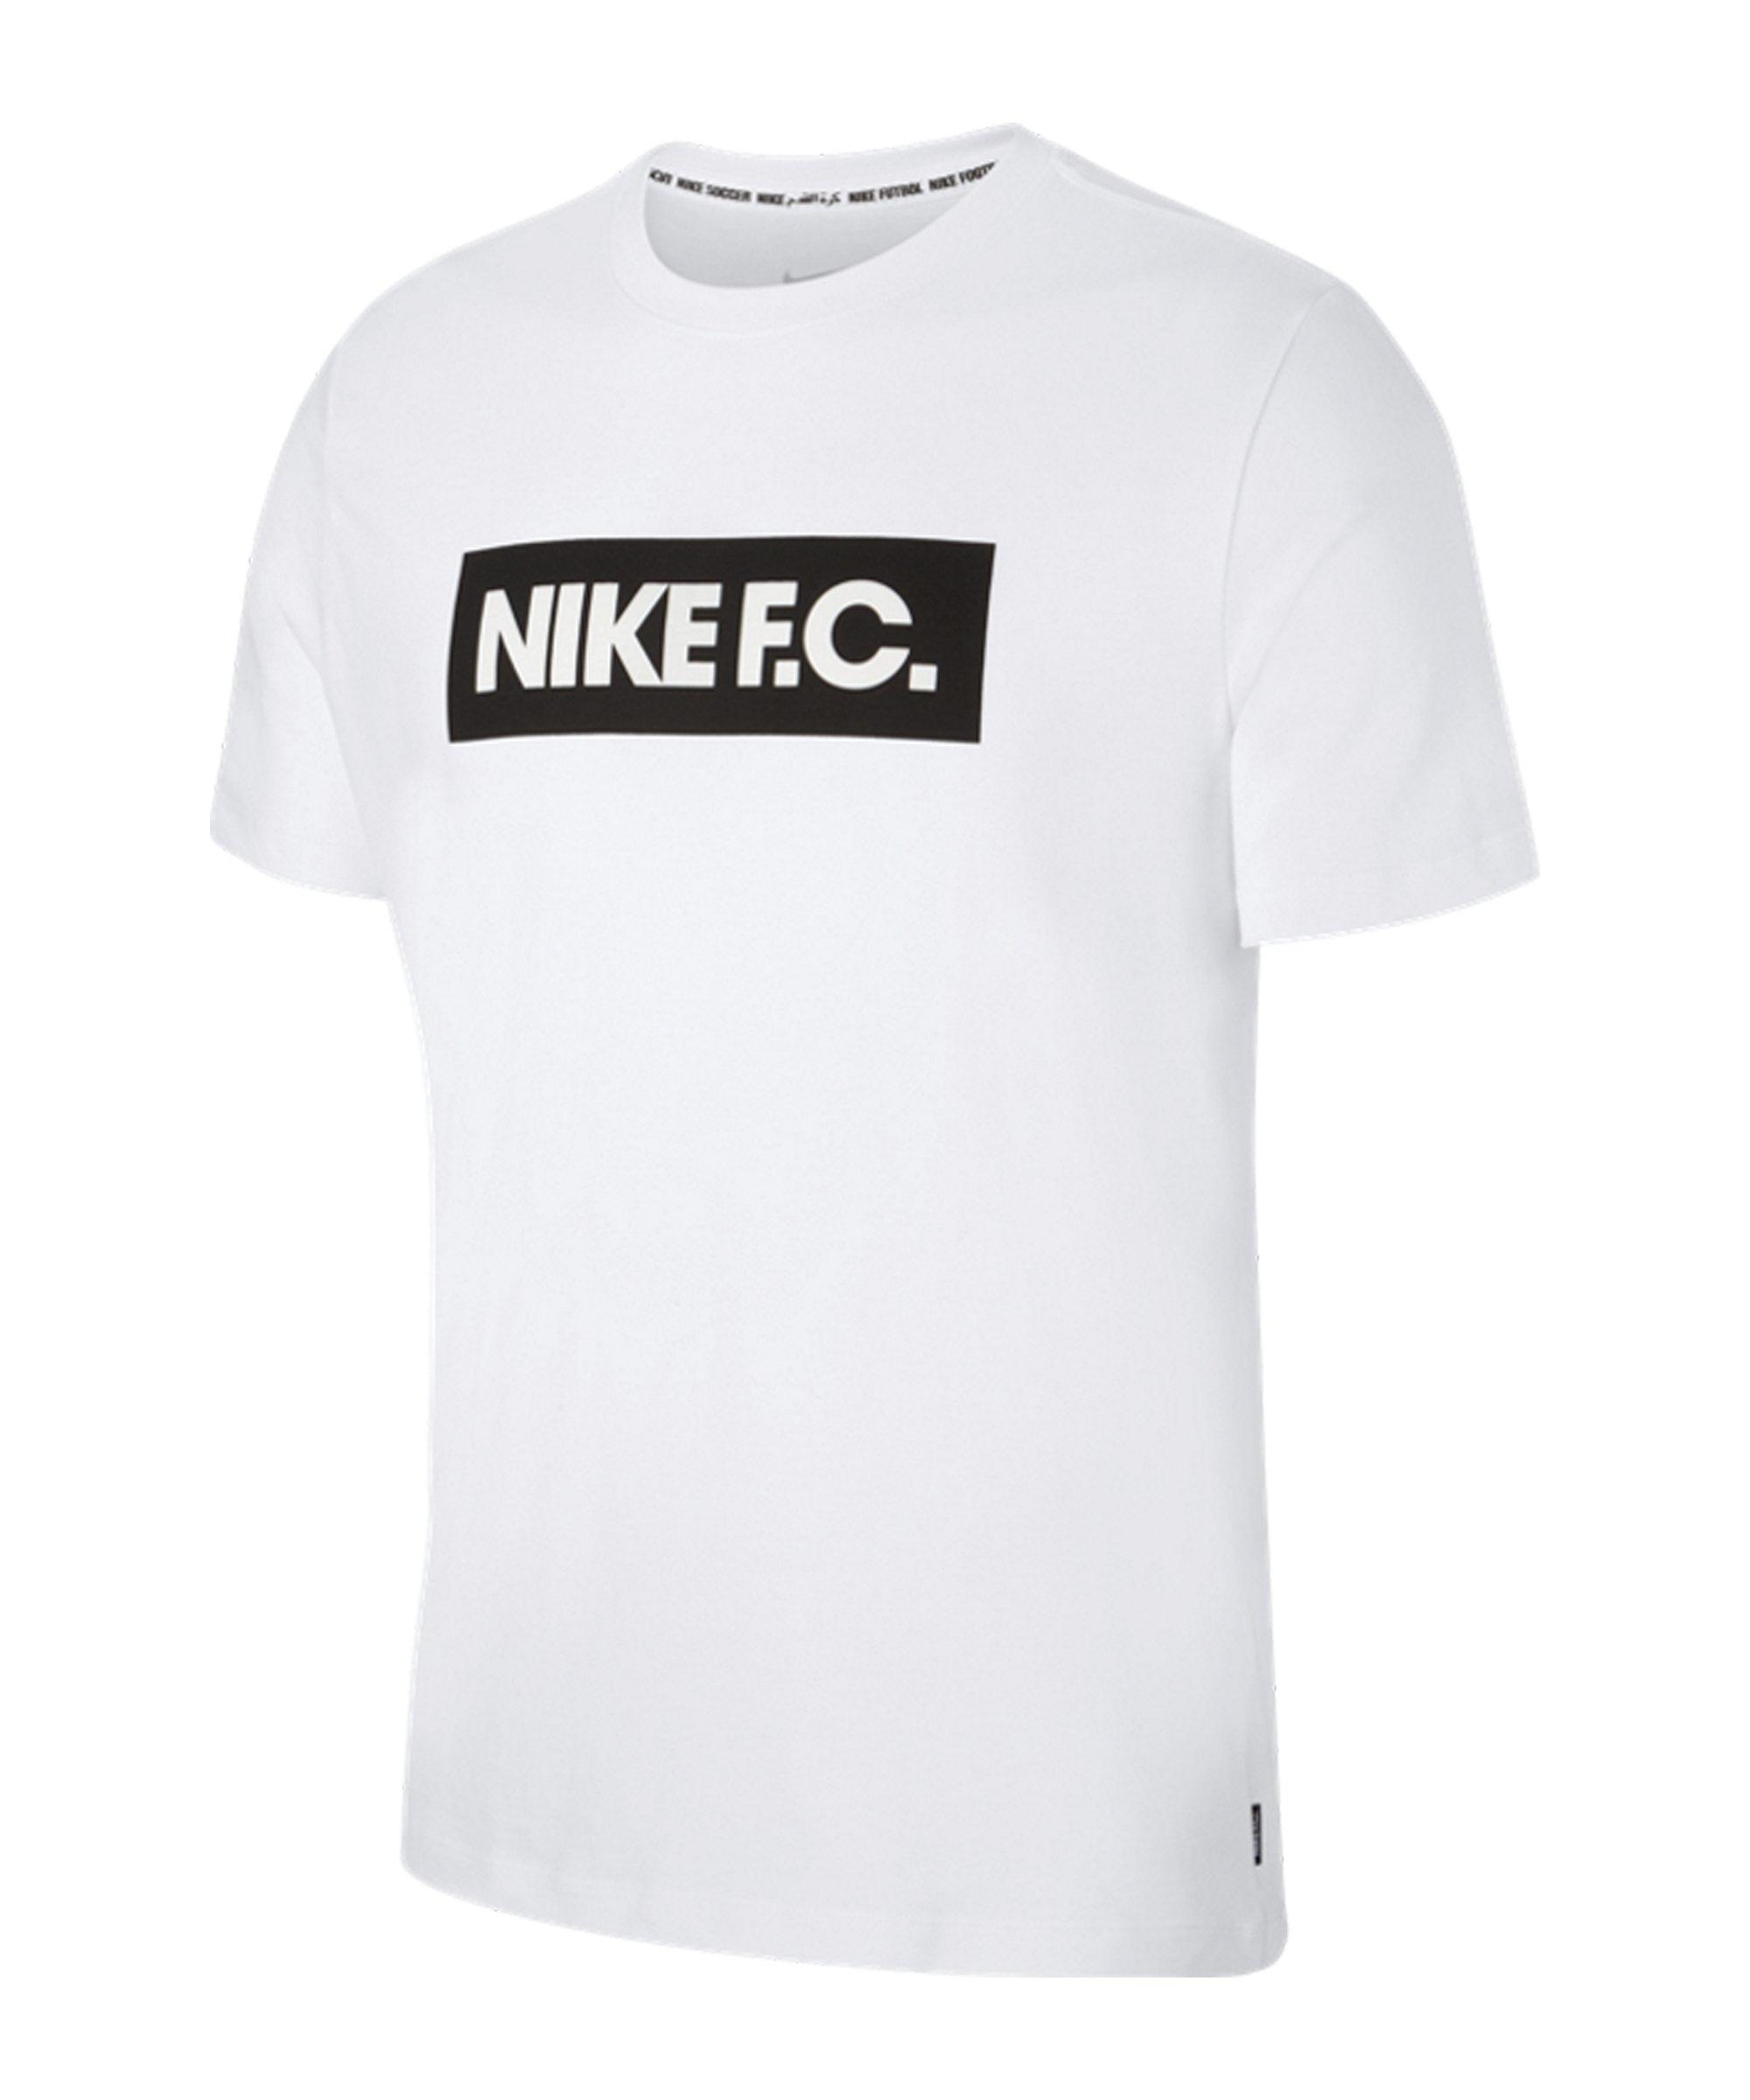 Nike F.C. Essential T-Shirt Weiss Schwarz F100 - weiss